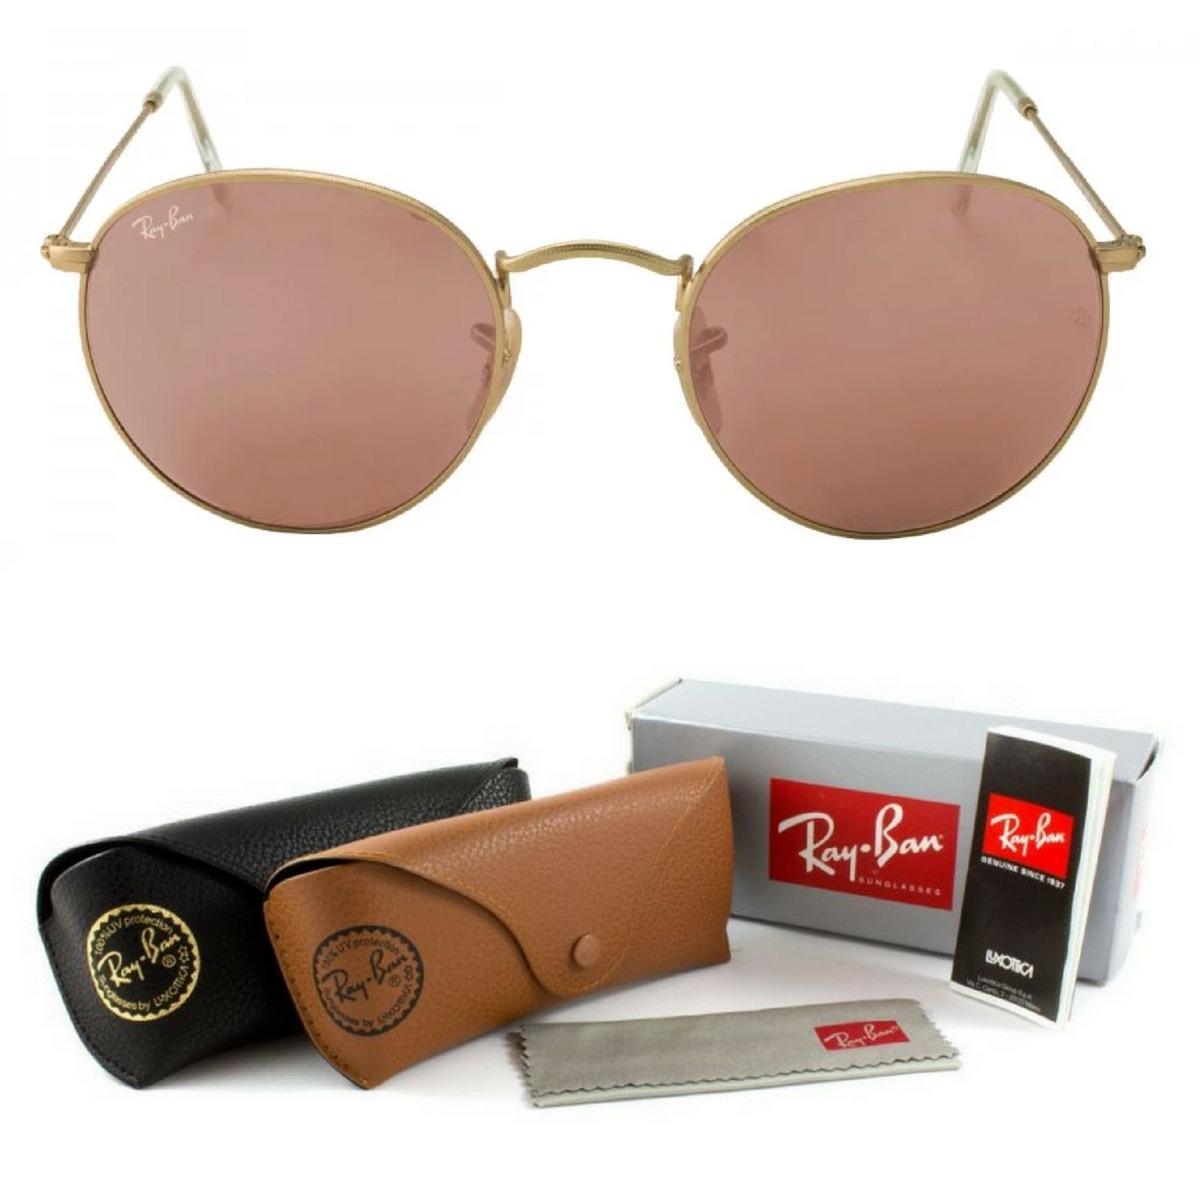 75ef612788d56 oculos redondo round john lenon rose feminino dourado origin. Carregando  zoom.